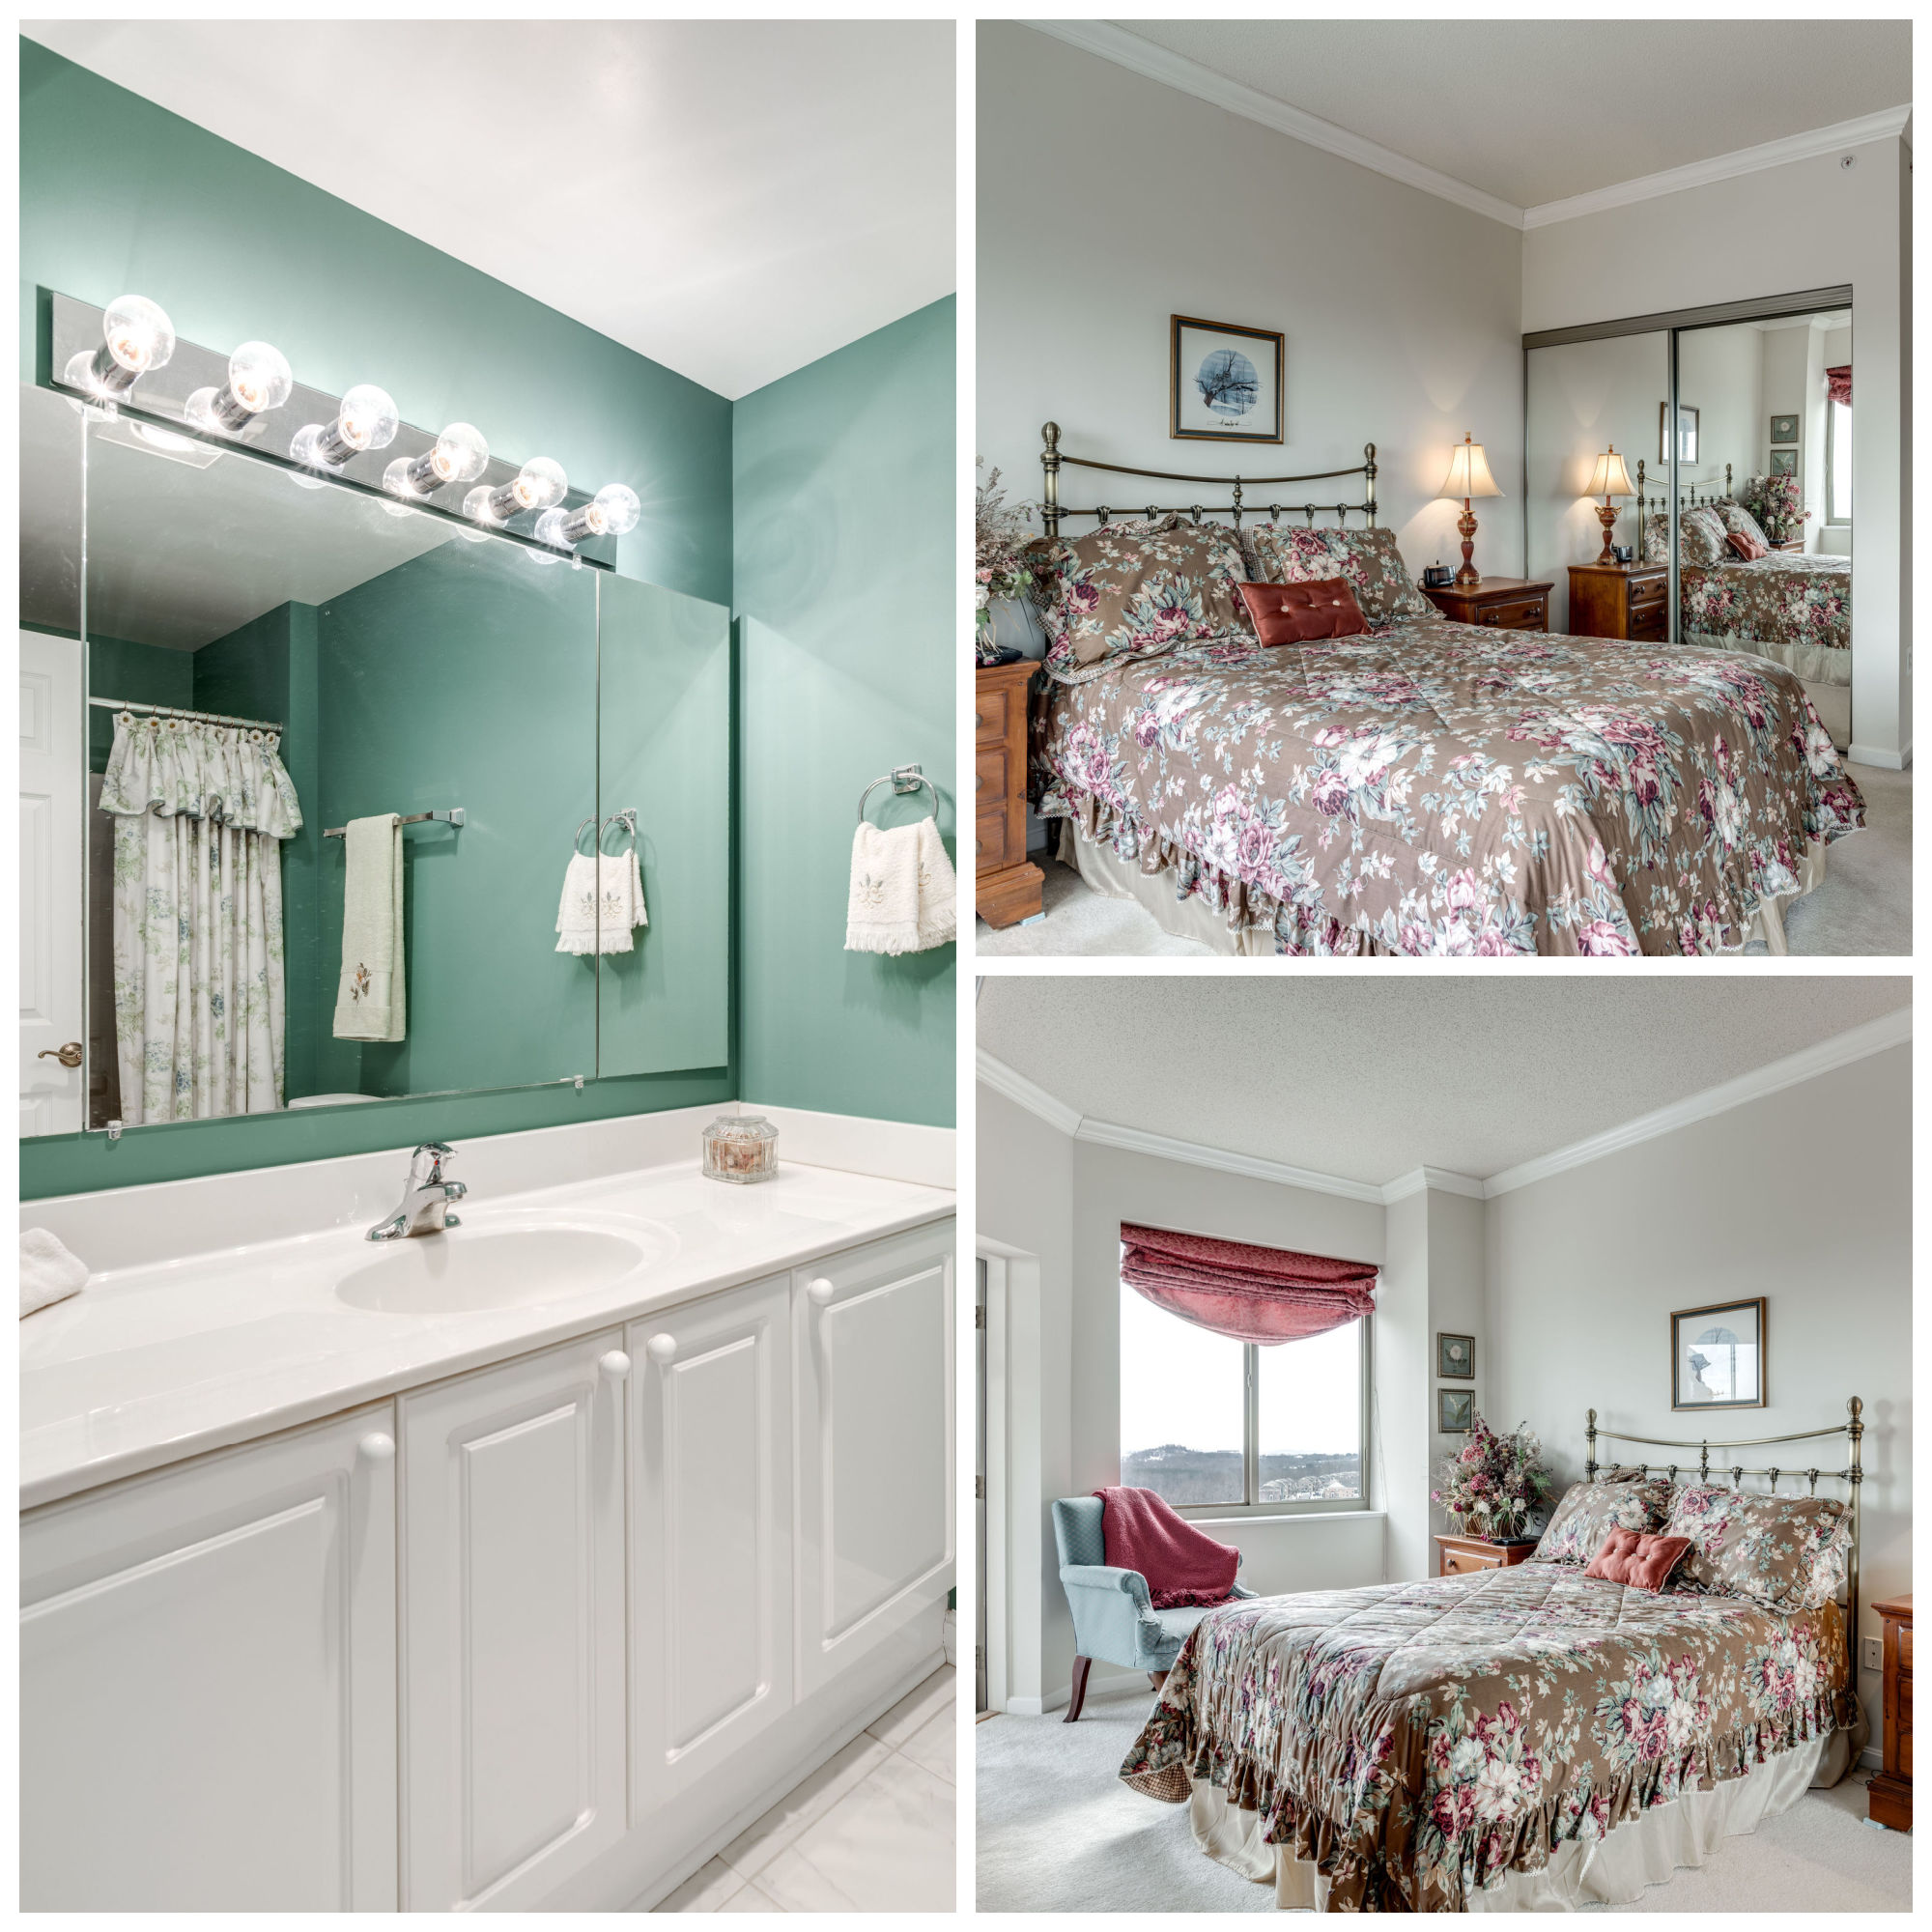 19355 Cypress Ridge Ter #917, Lansdowne Woods- Additional Bedroom and Bath